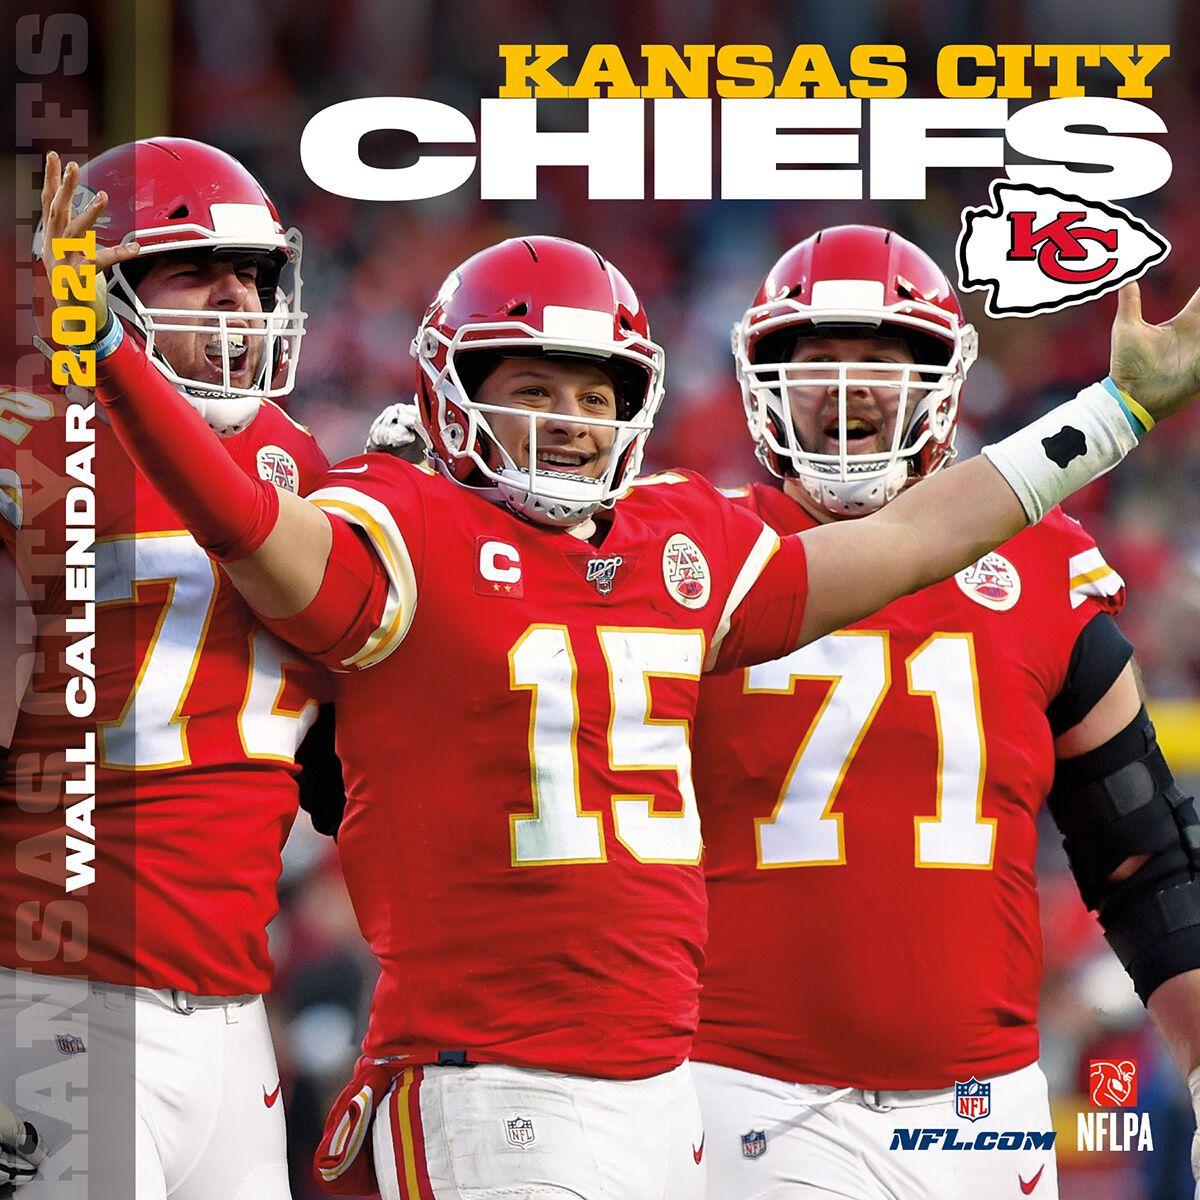 Kansas City Chiefs   Calendrier 2021 | NFL Calendrier mural | EMP